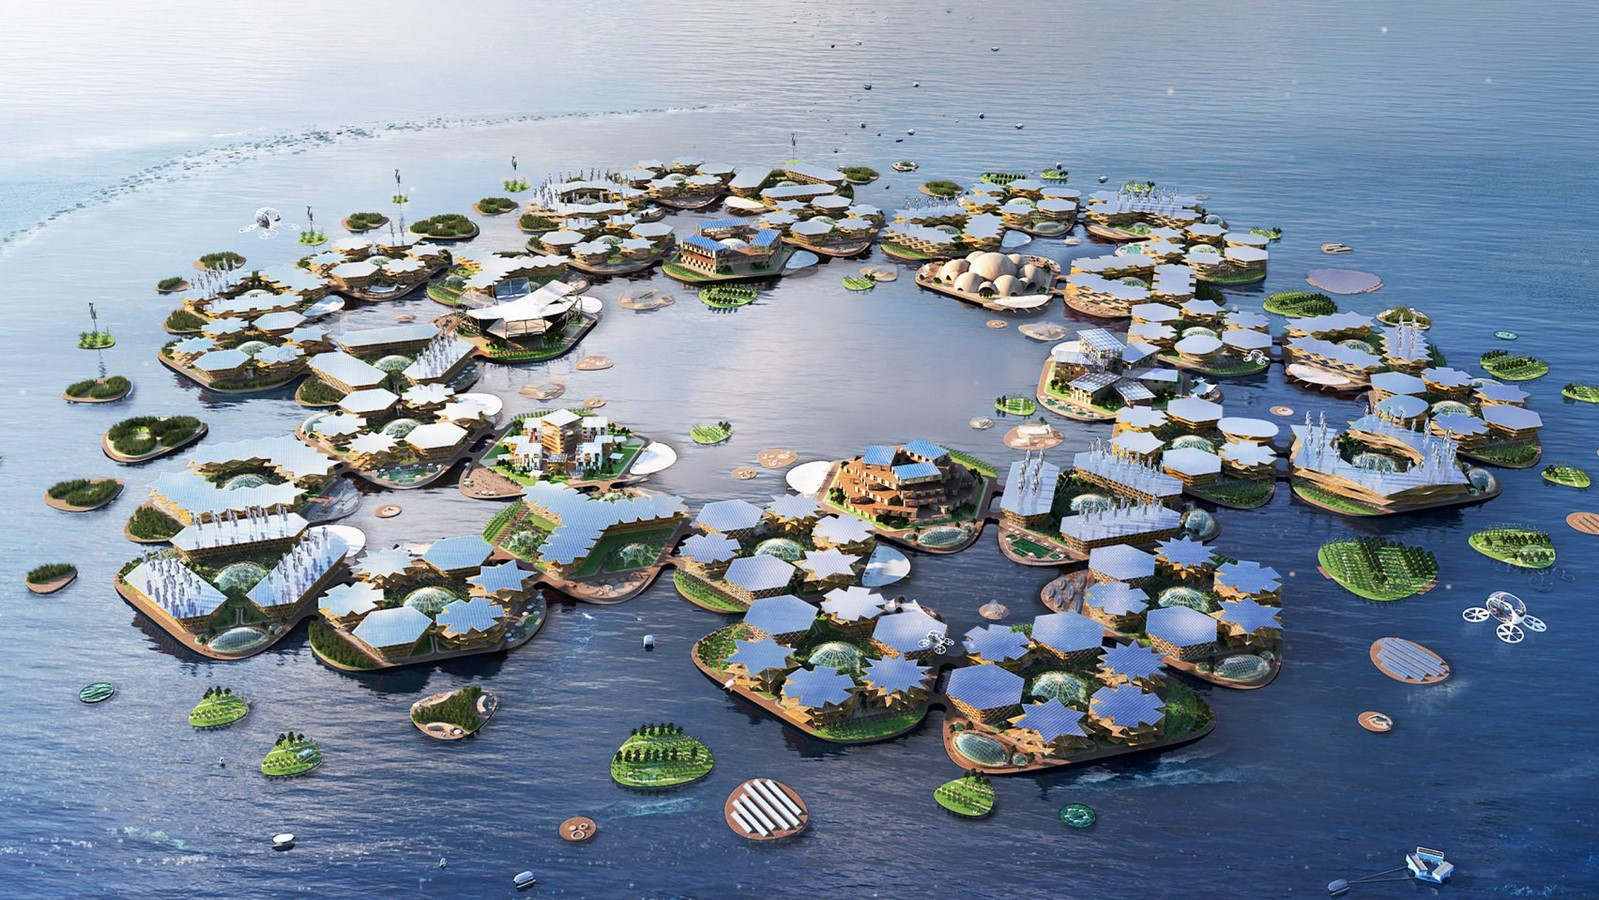 Oceanix City by Bjarke Ingles: The Floating City - Sheet1